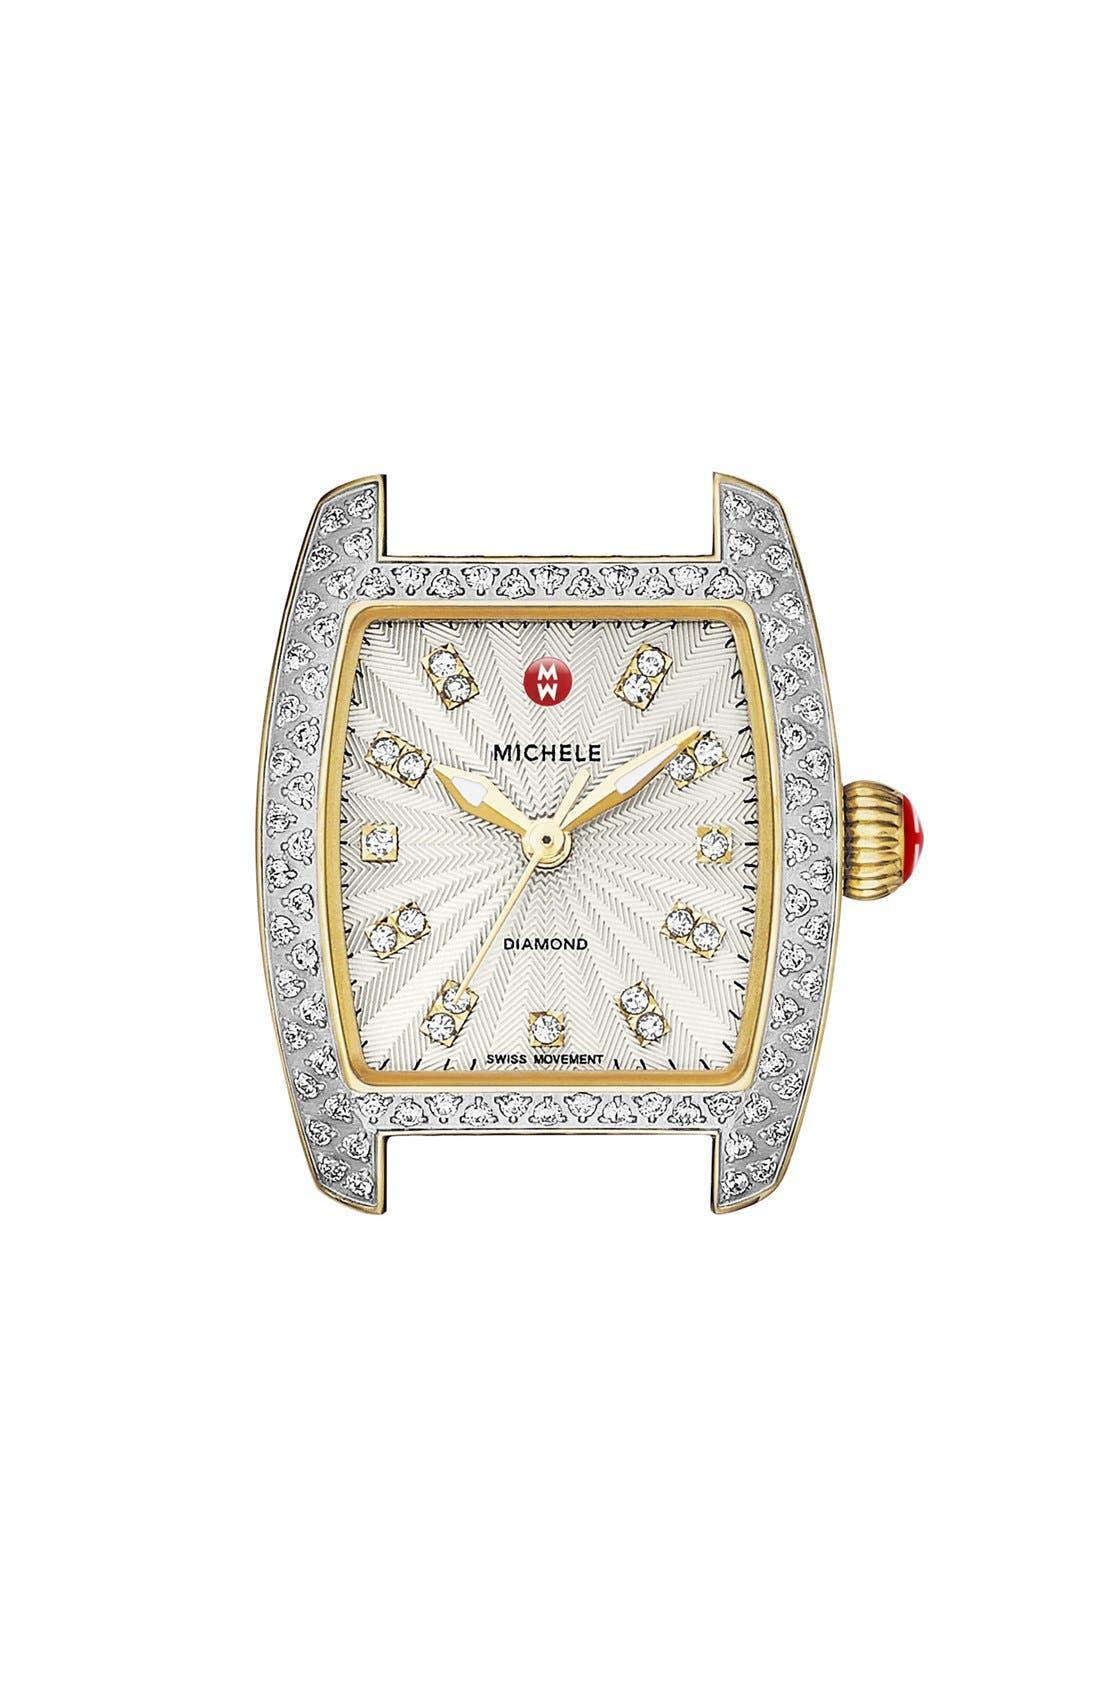 Alternate Image 1 Selected - MICHELE 'Urban Petite Diamond' Diamond Dial Watch Case, 21mm x 22mm (Limited Edition)